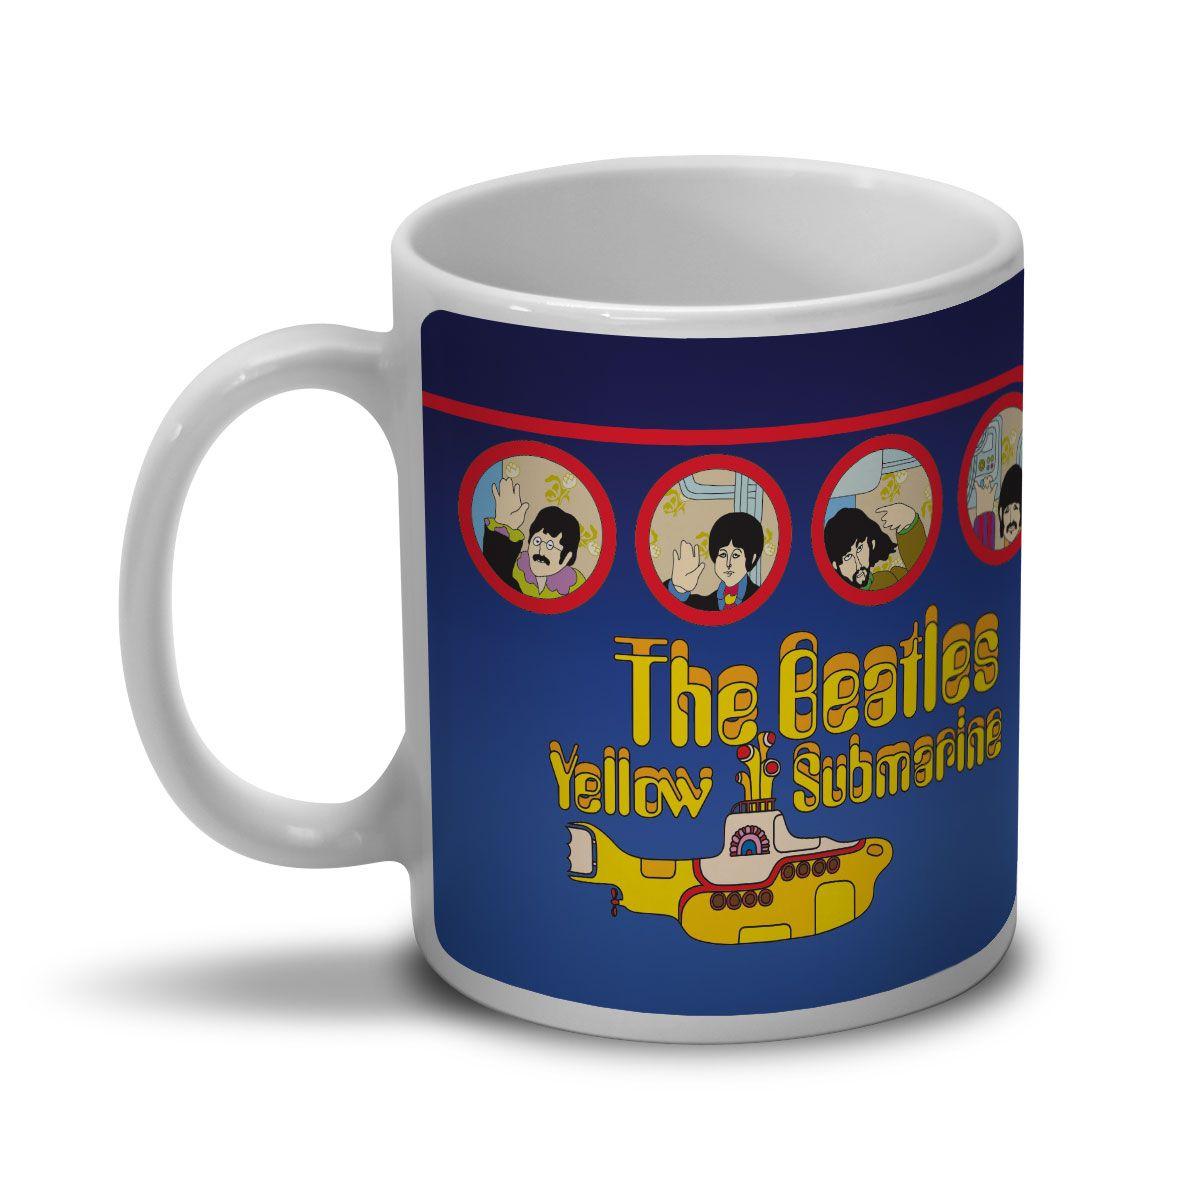 Caneca The Beatles Yellow Submarine Songtrack